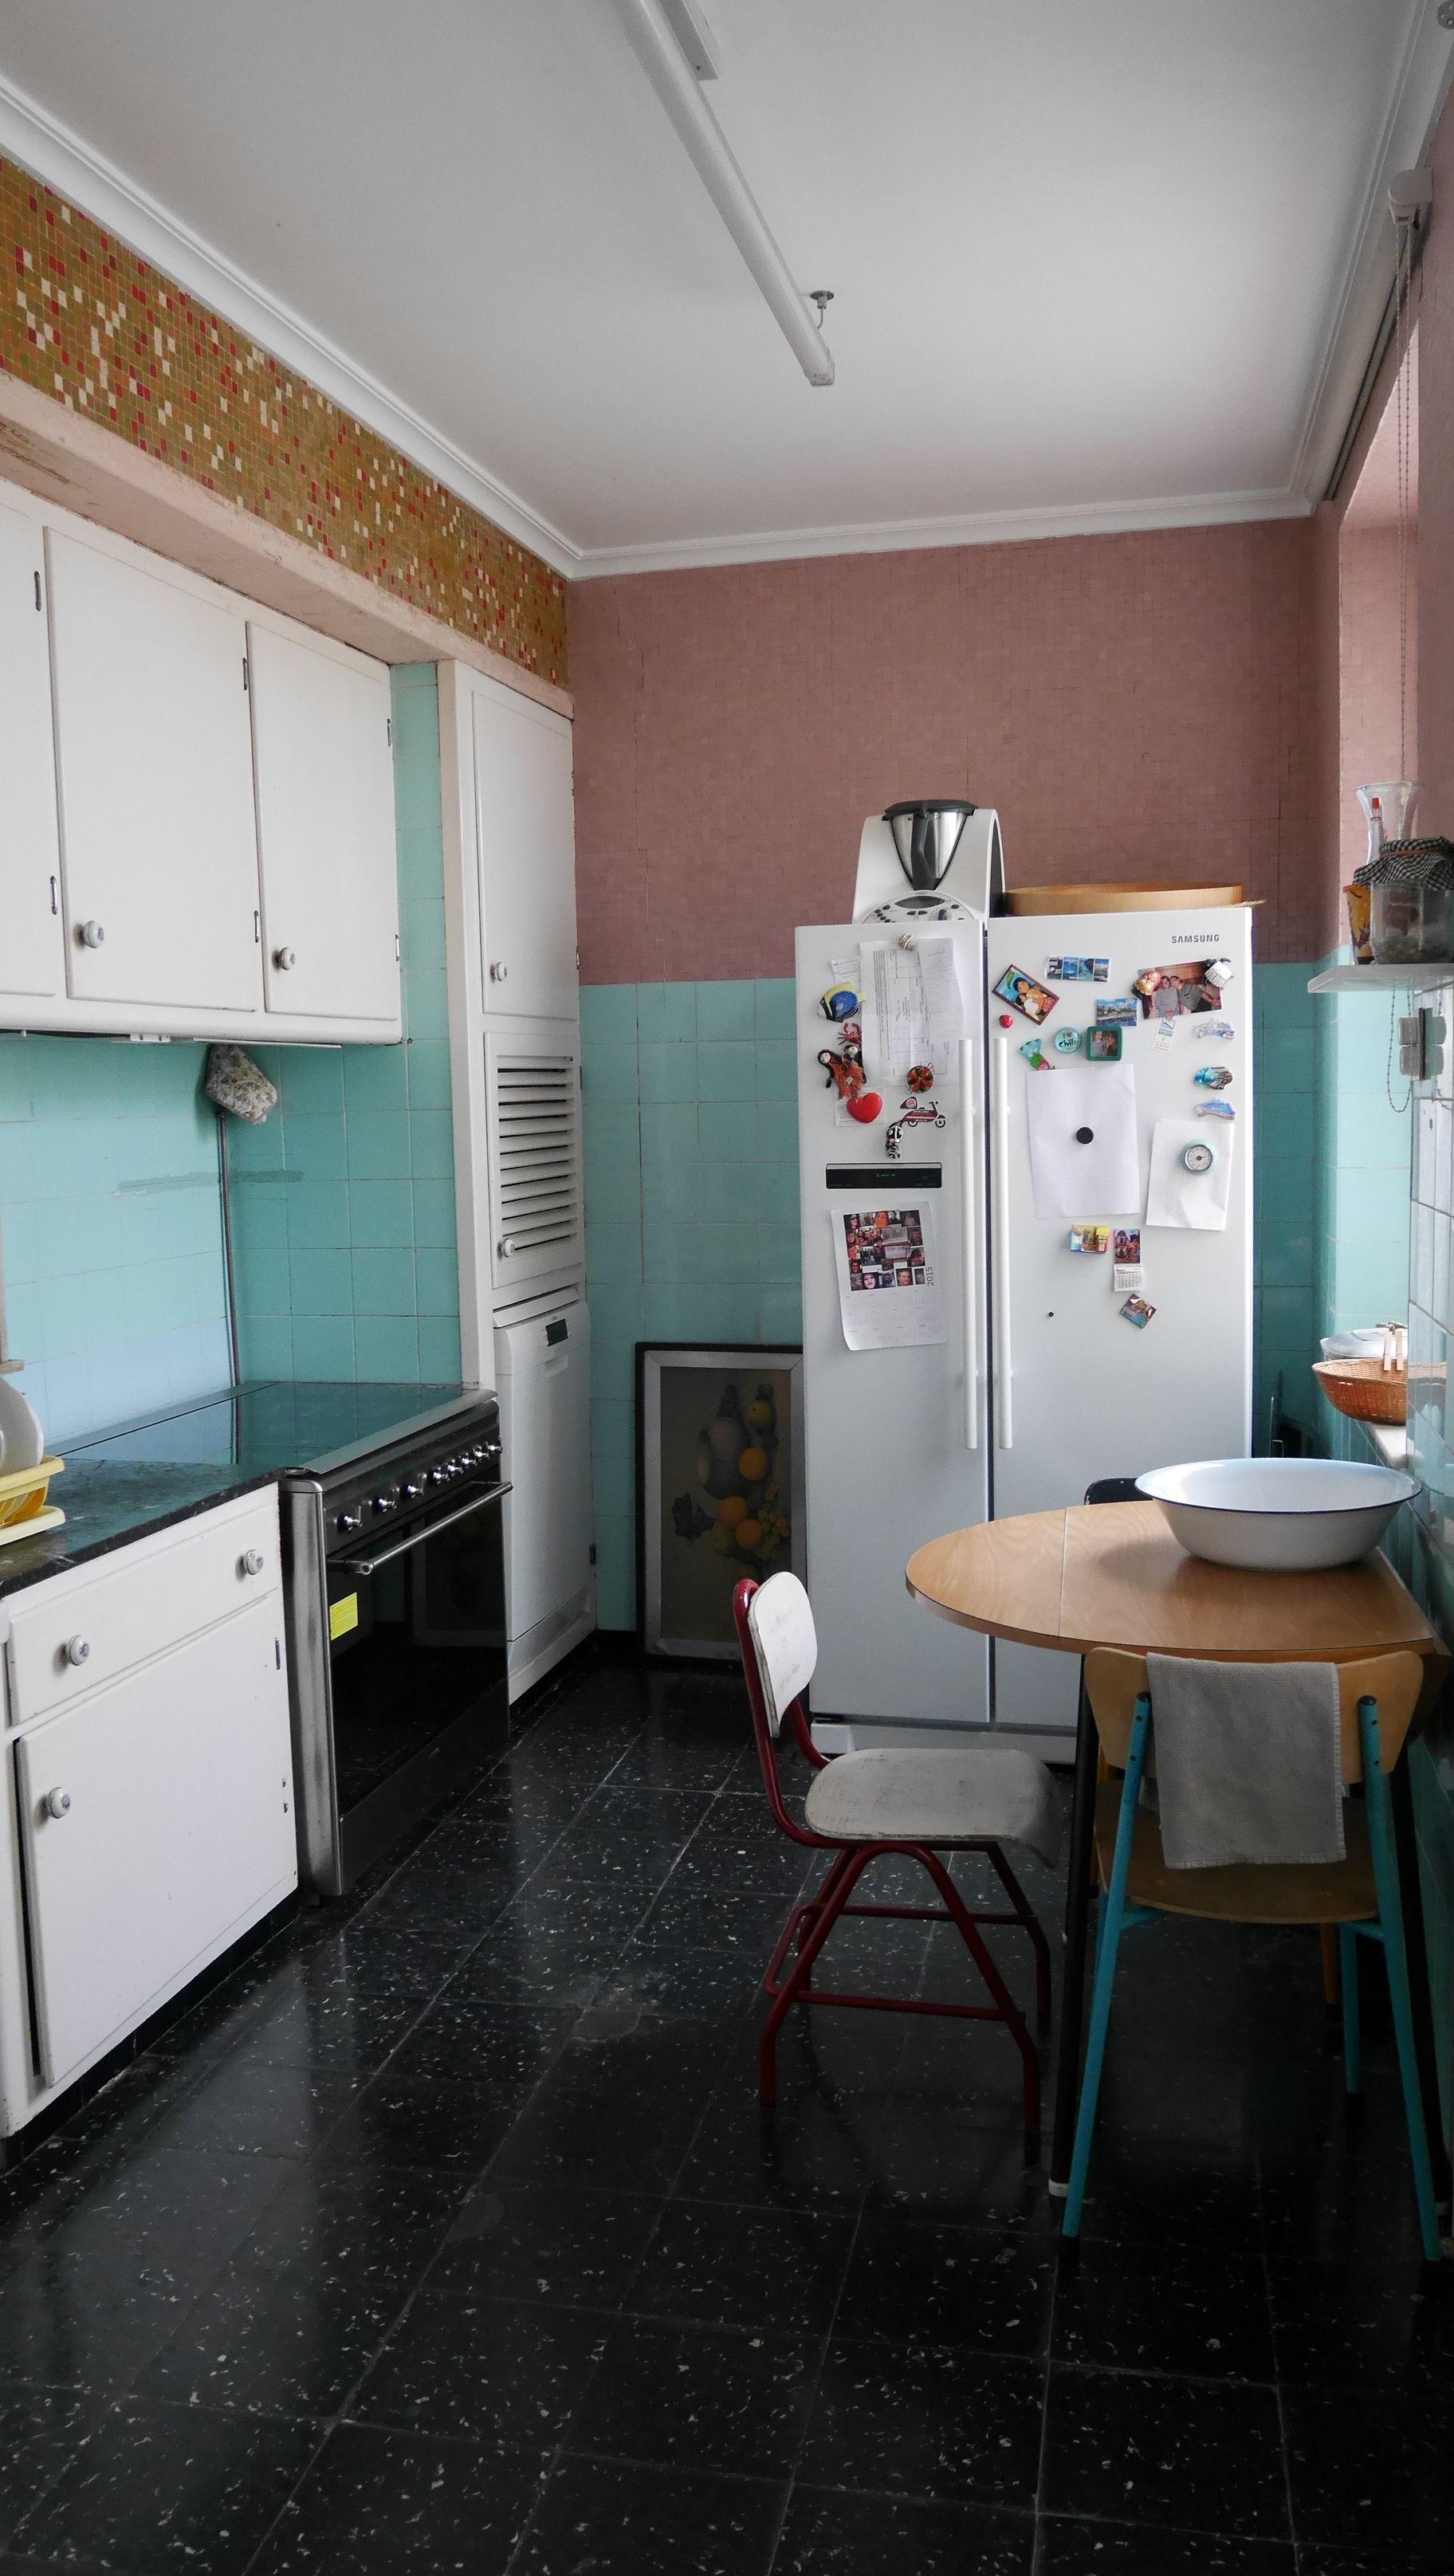 Vintage innenarchitektur menorca cocina kitchen restored authentic quintana partners home